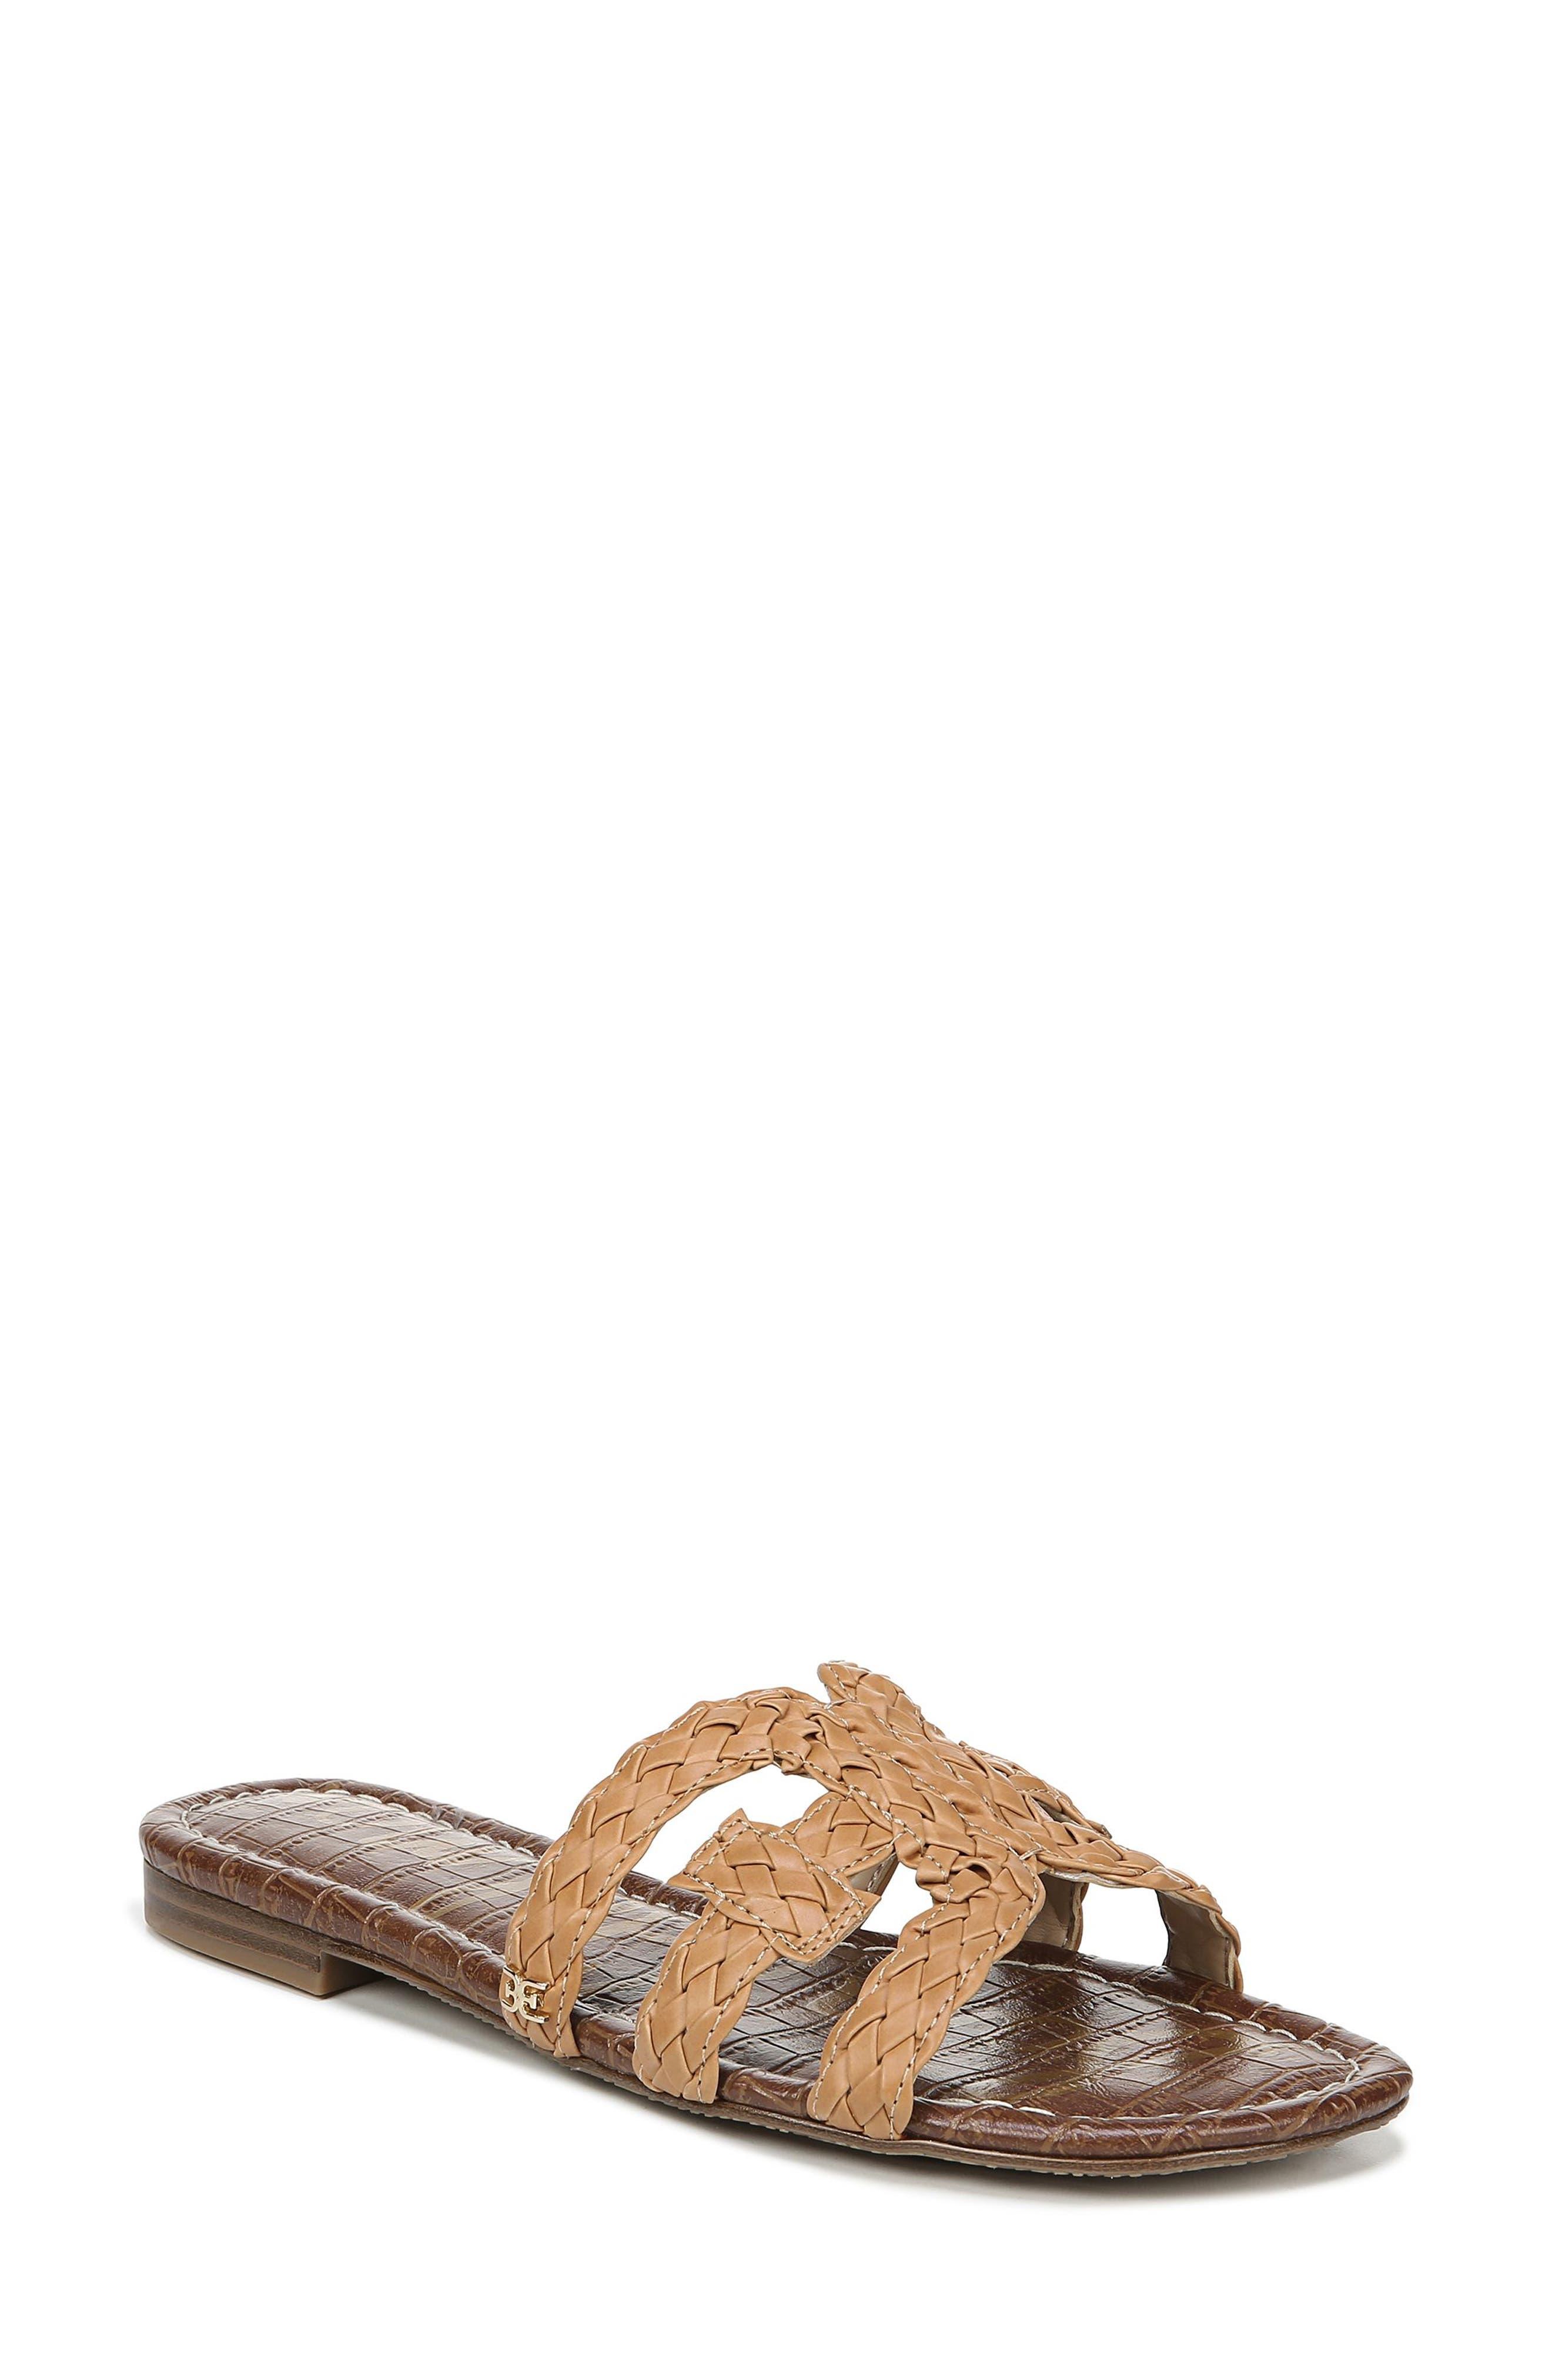 Sam Edelman Beckie Slide Sandal- Beige